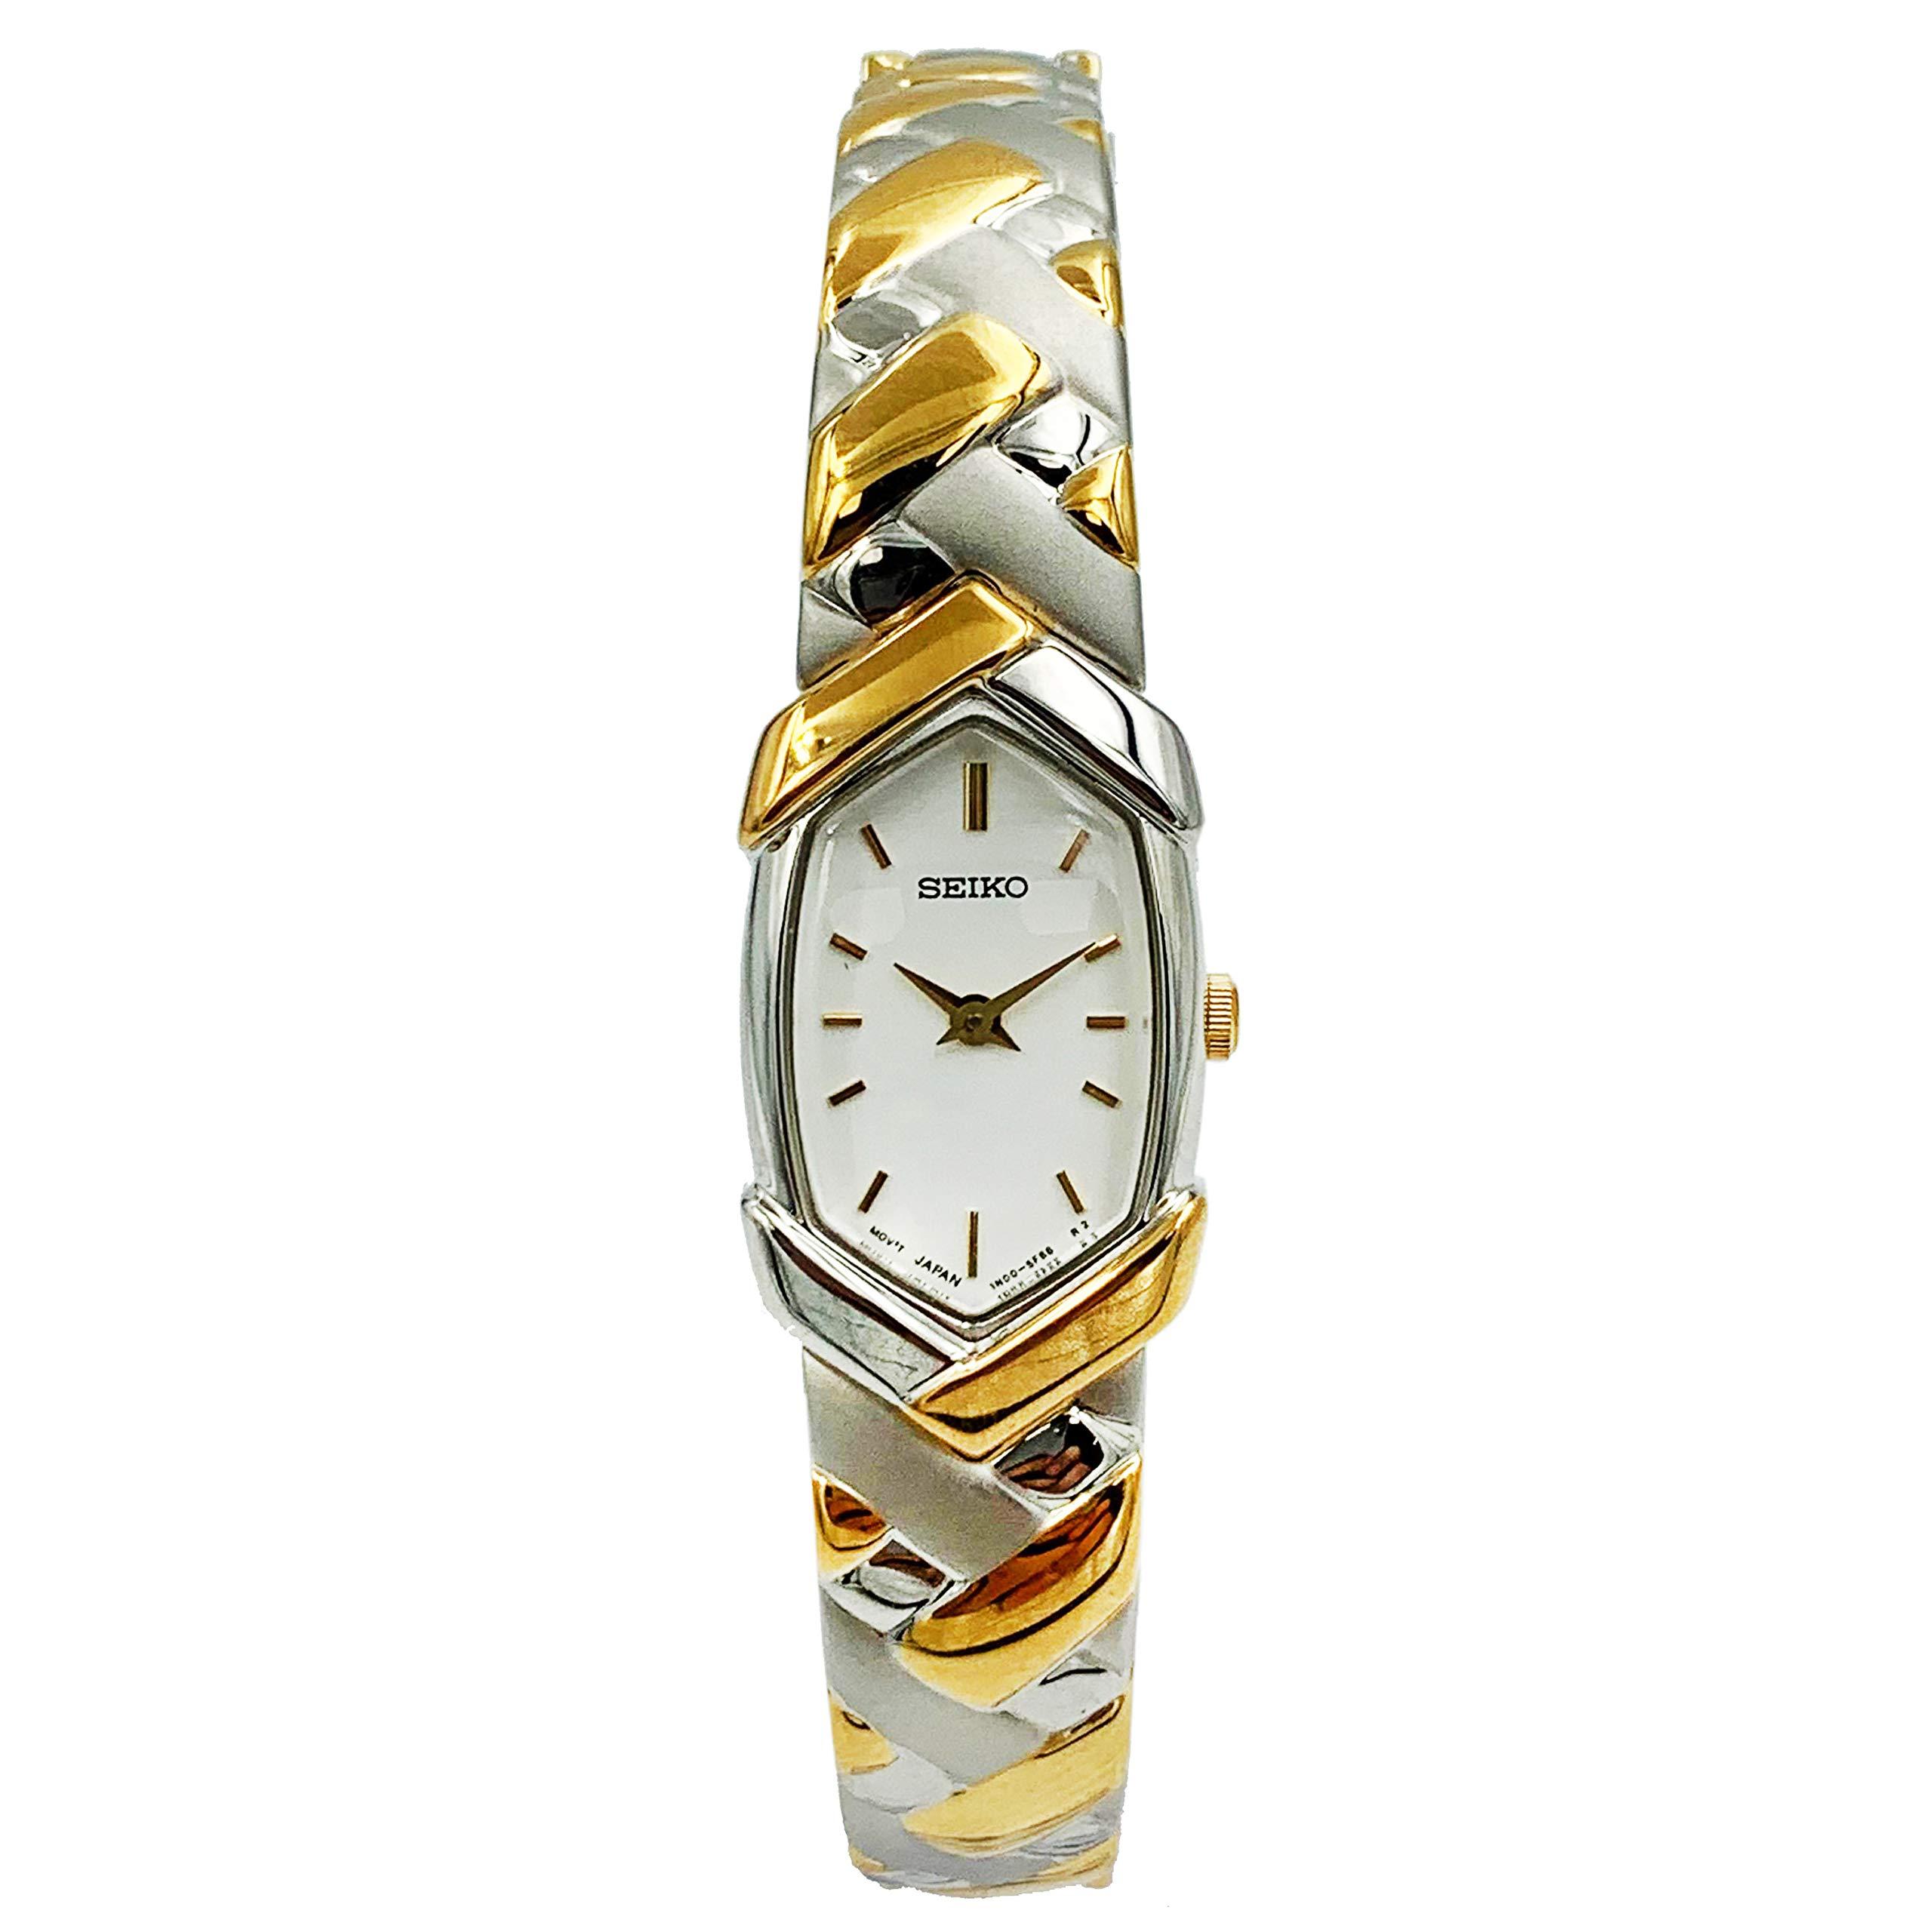 Seiko Women's Quartz Male Watch SXJZ28 (Certified Pre-Owned)